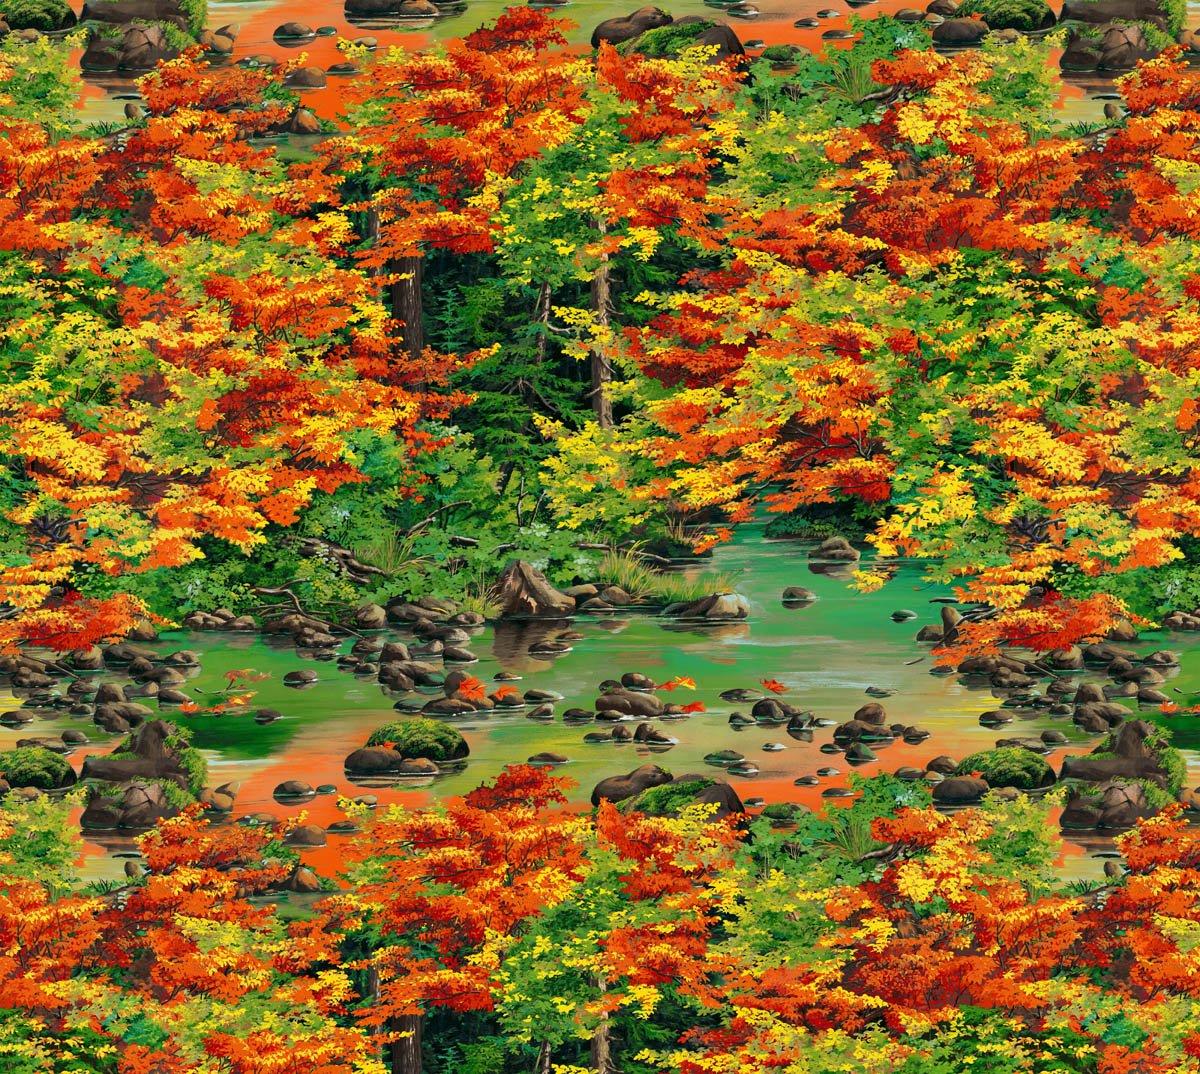 Autumn Blaze 61375 Scenic